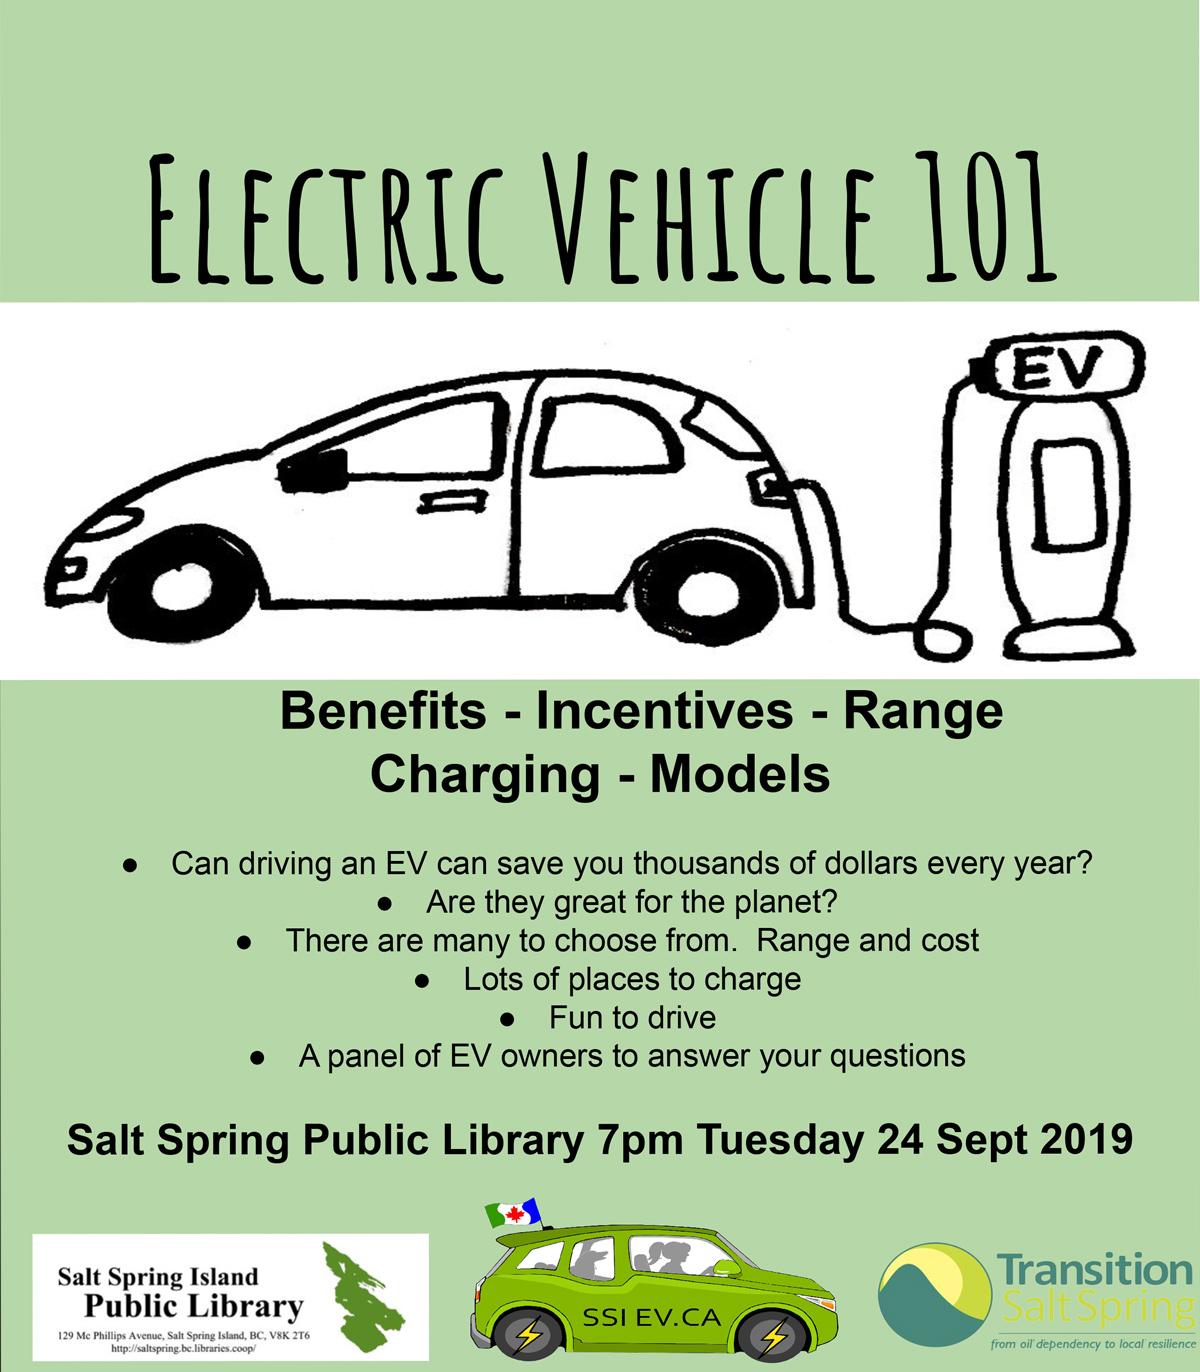 Electric Vehicle 101